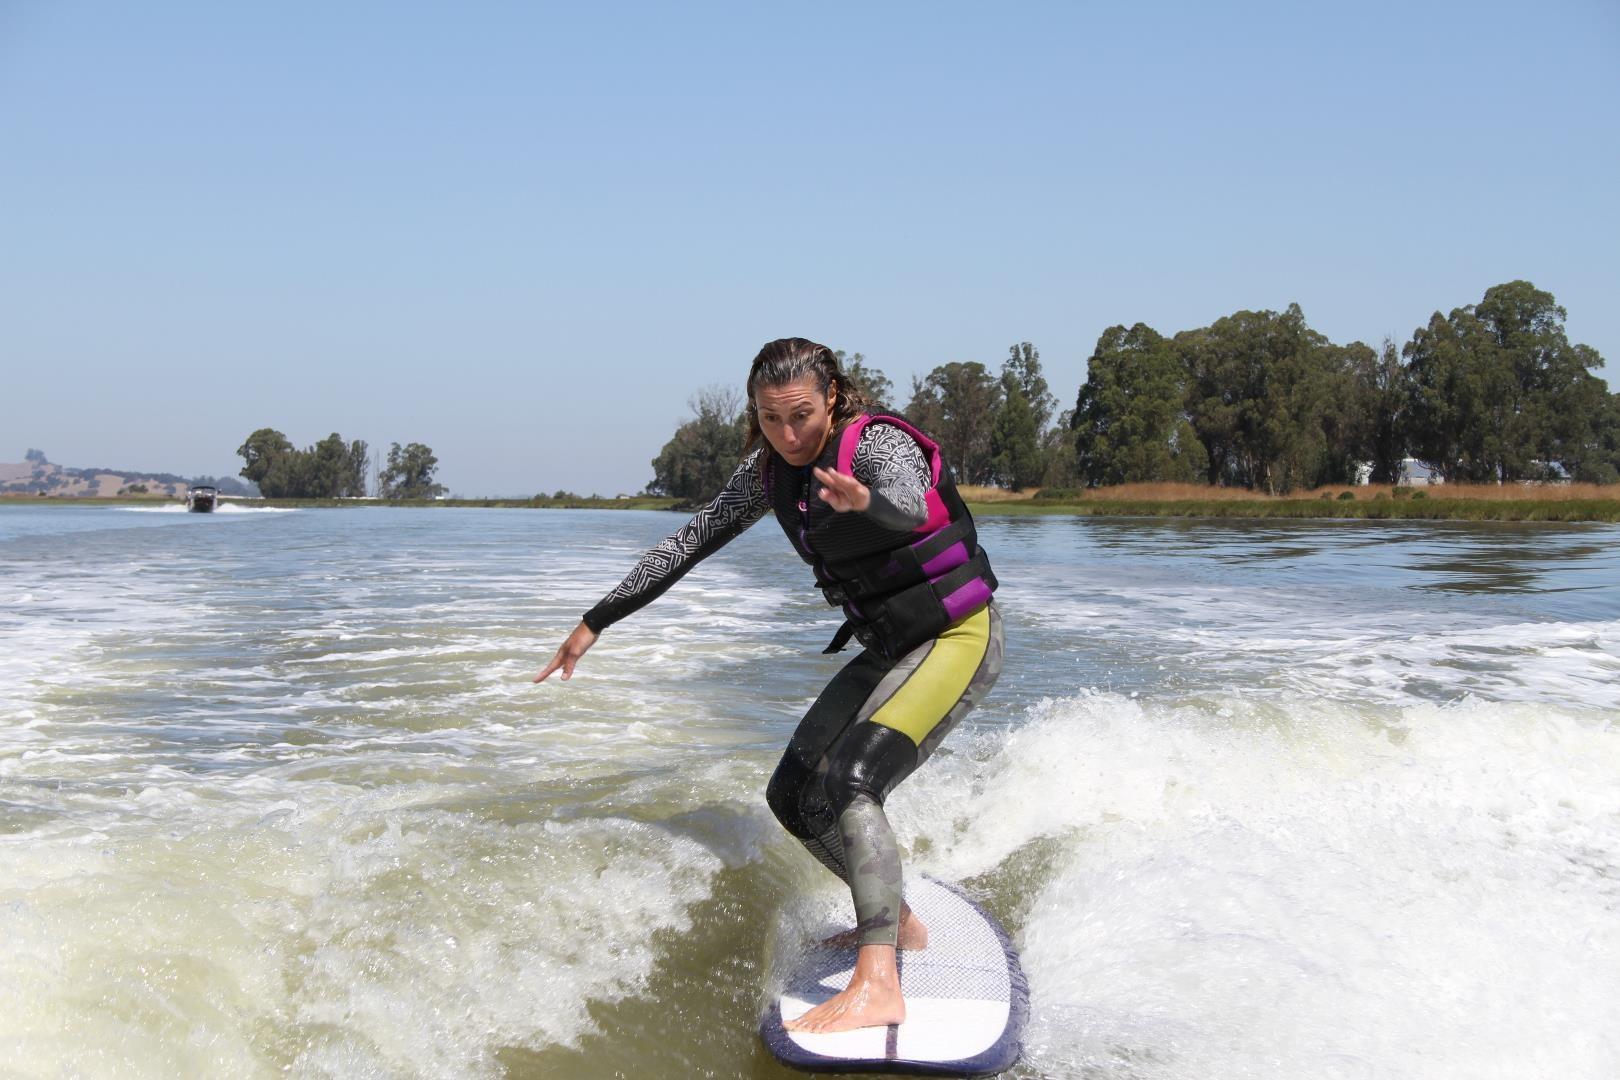 surf technique training going for 5